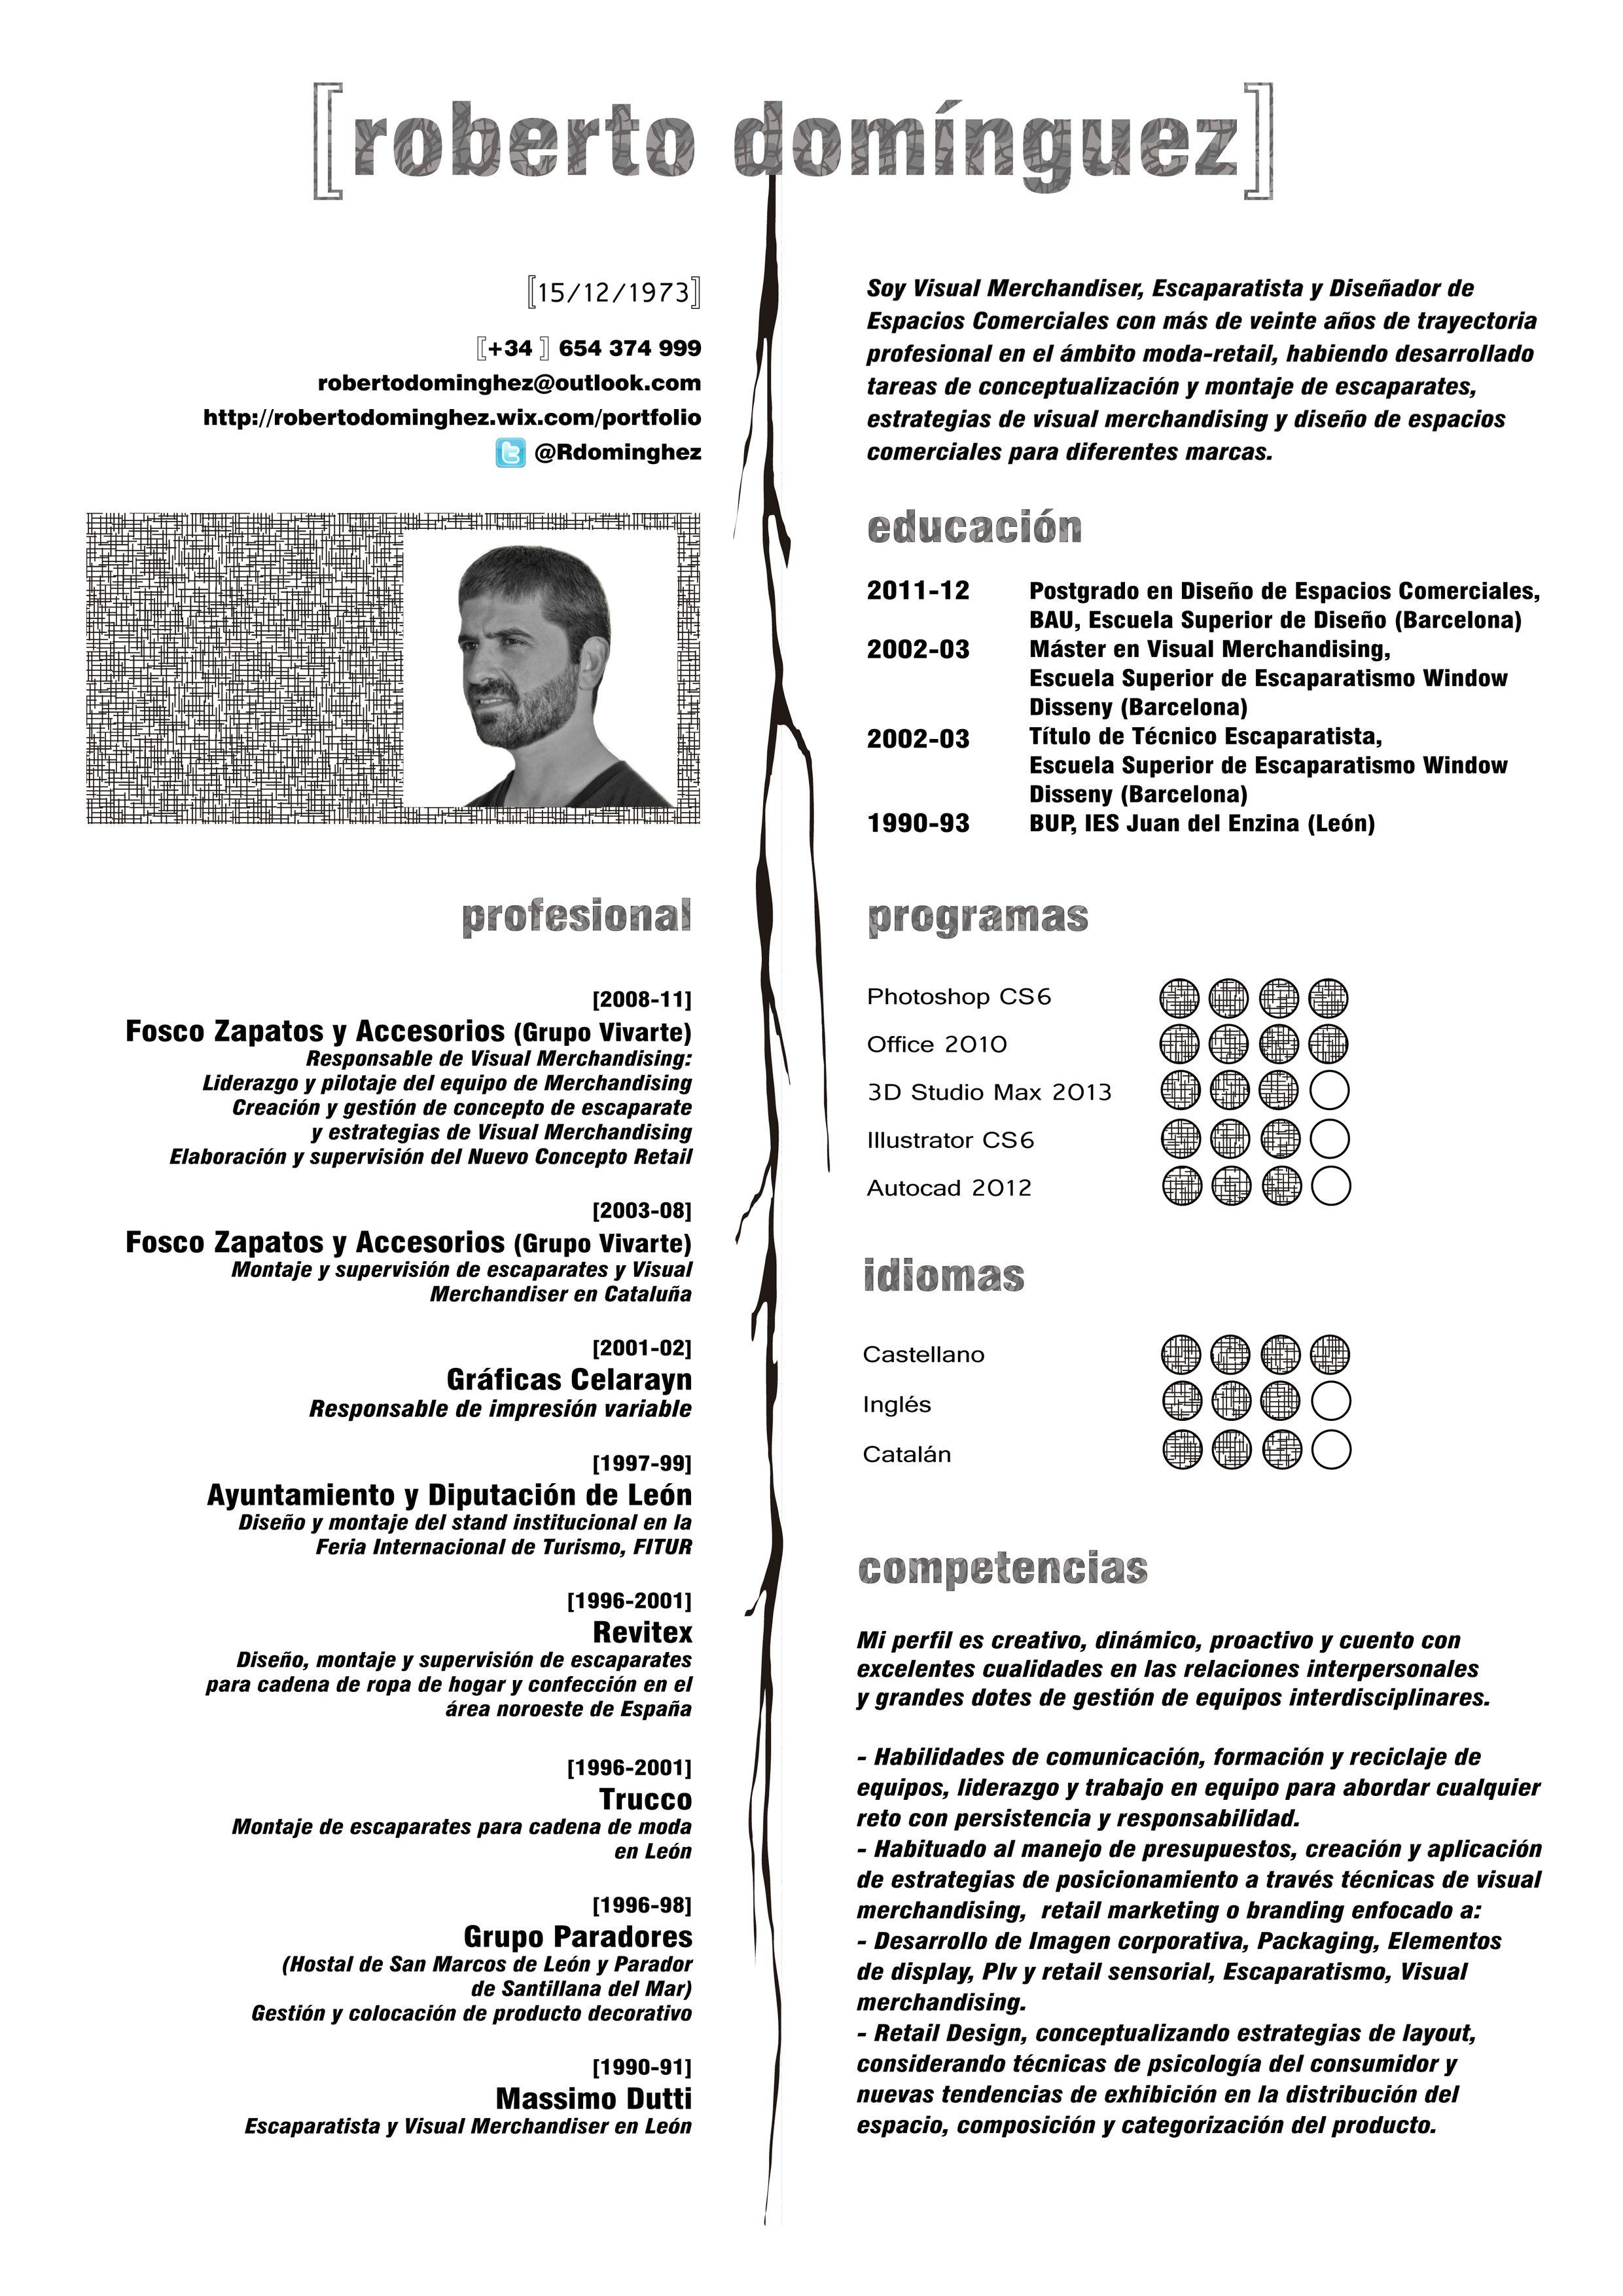 Pin By Jul Labelle On Design It Cv Curriculum Vitae Cv Template